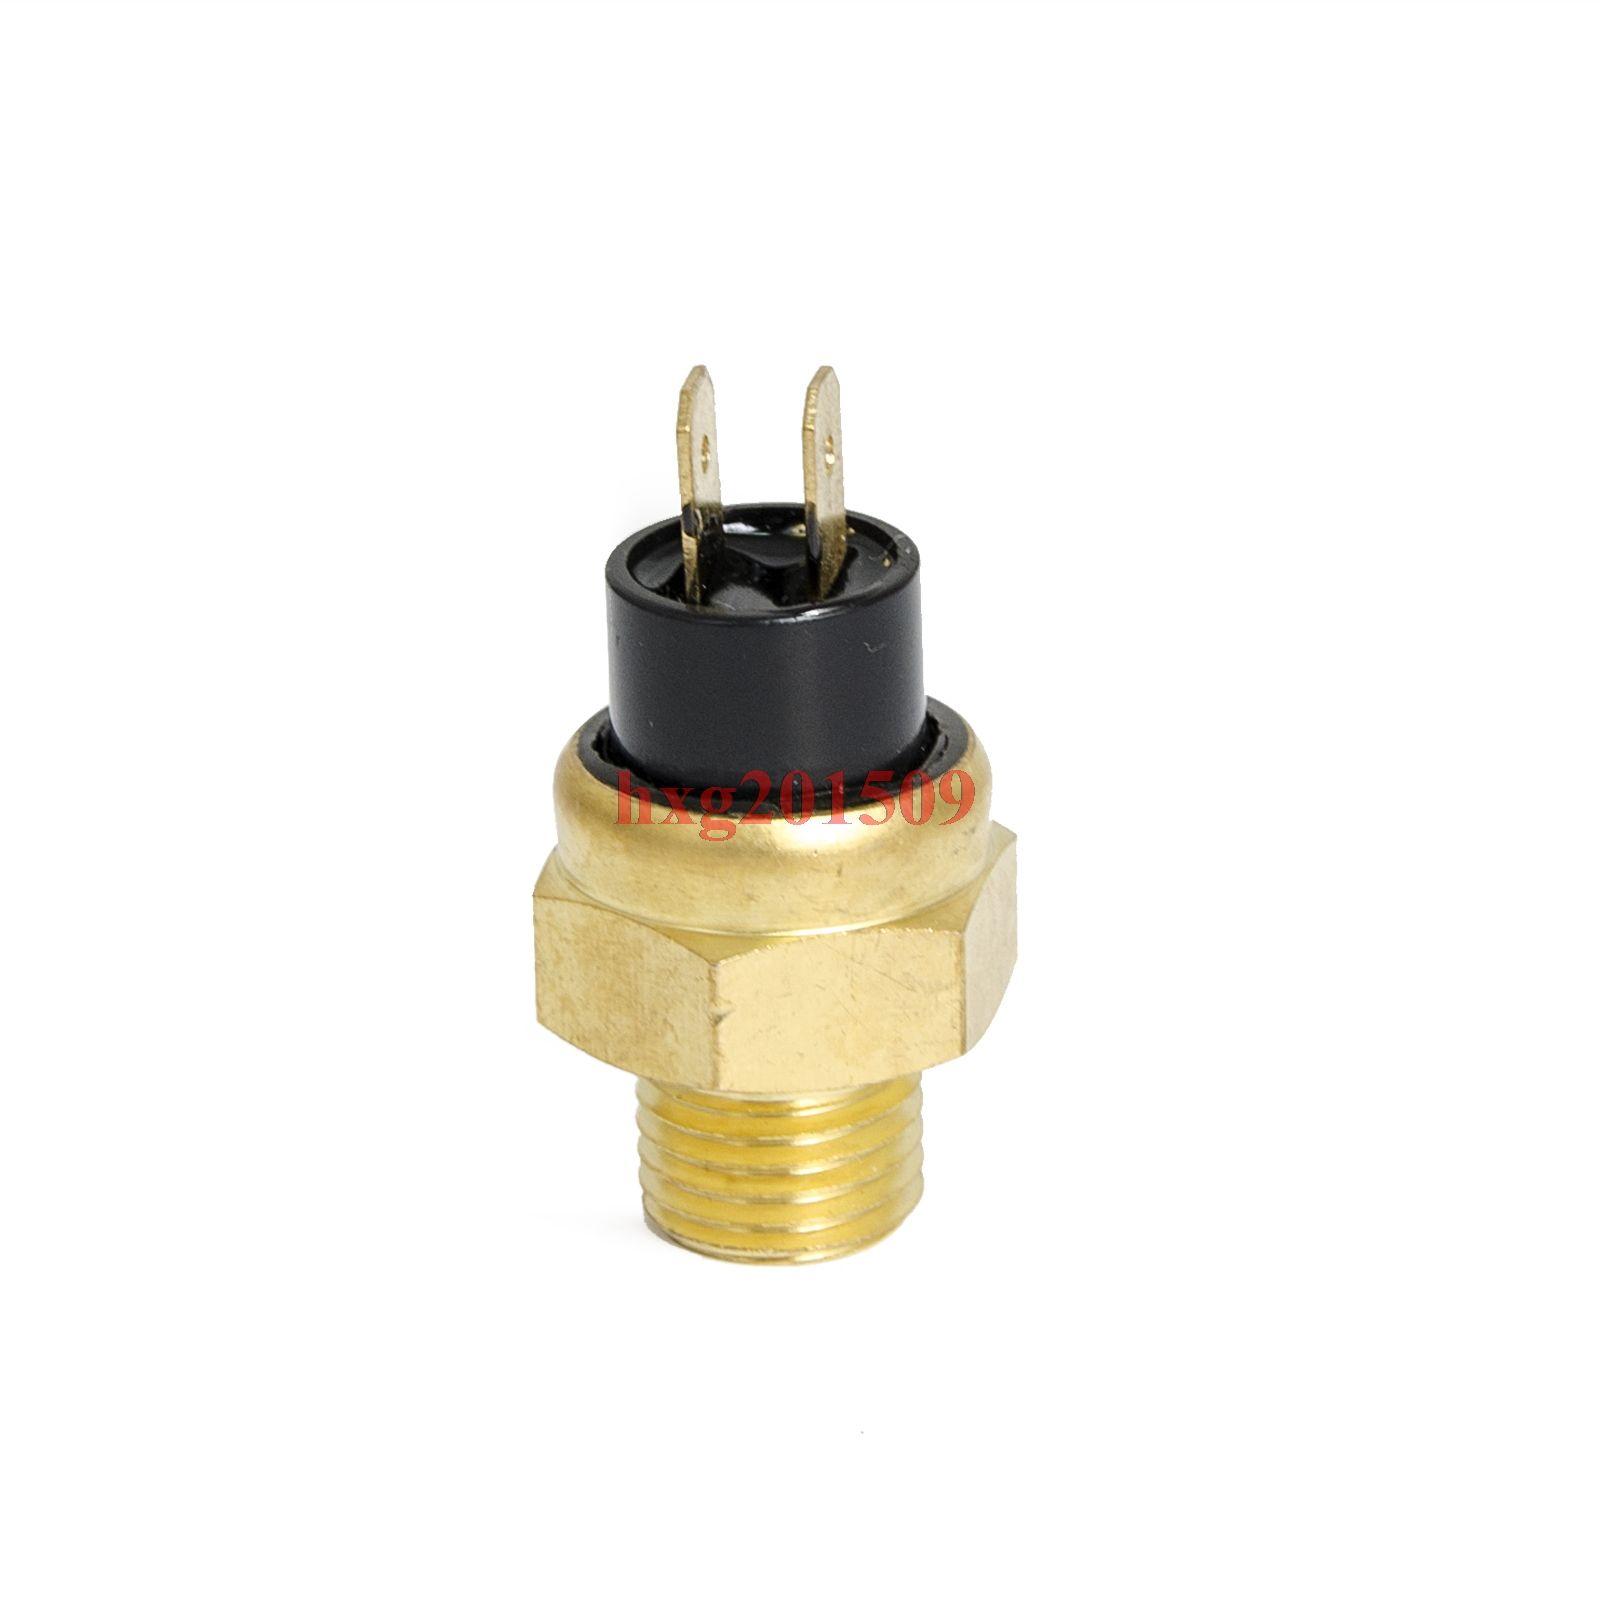 NICECNC Temperature Switch Radiator Fan For KTM Husqvarna Husaberg Engine Parts Radiator Water Temperature Sensor 2/4 Stroke